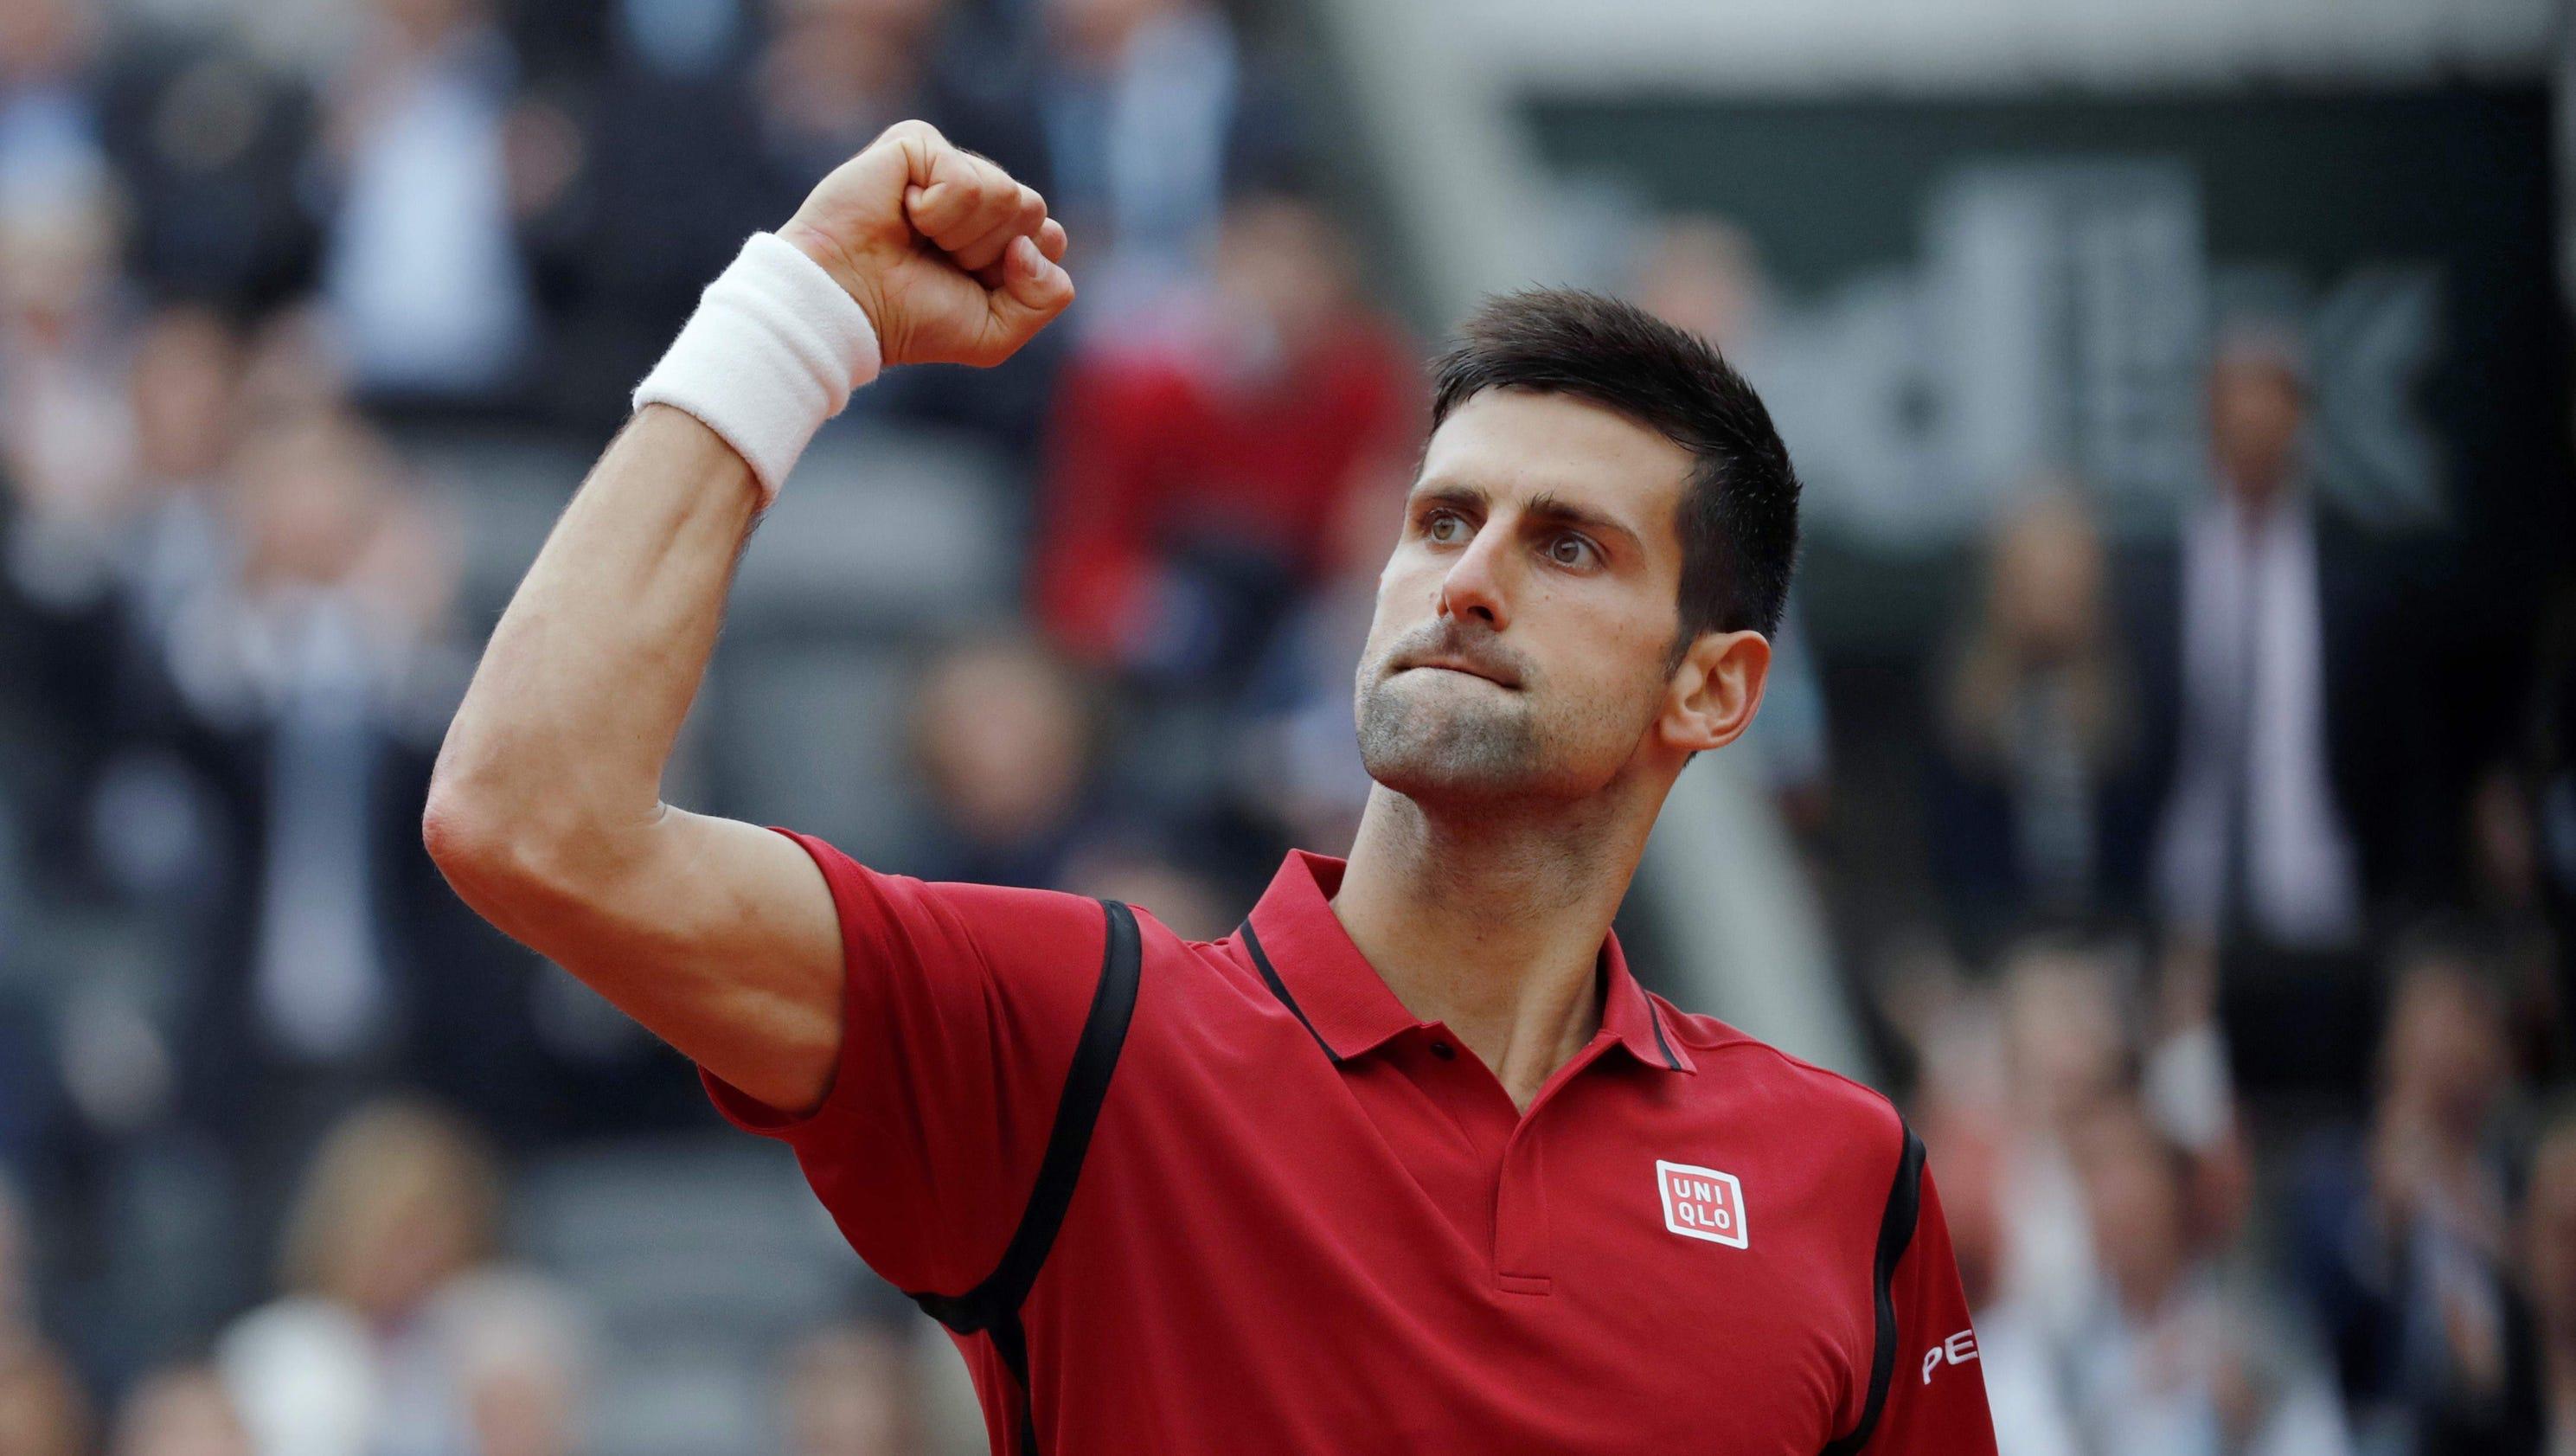 Novak Djokovic beats Andy Murray in final, makes history